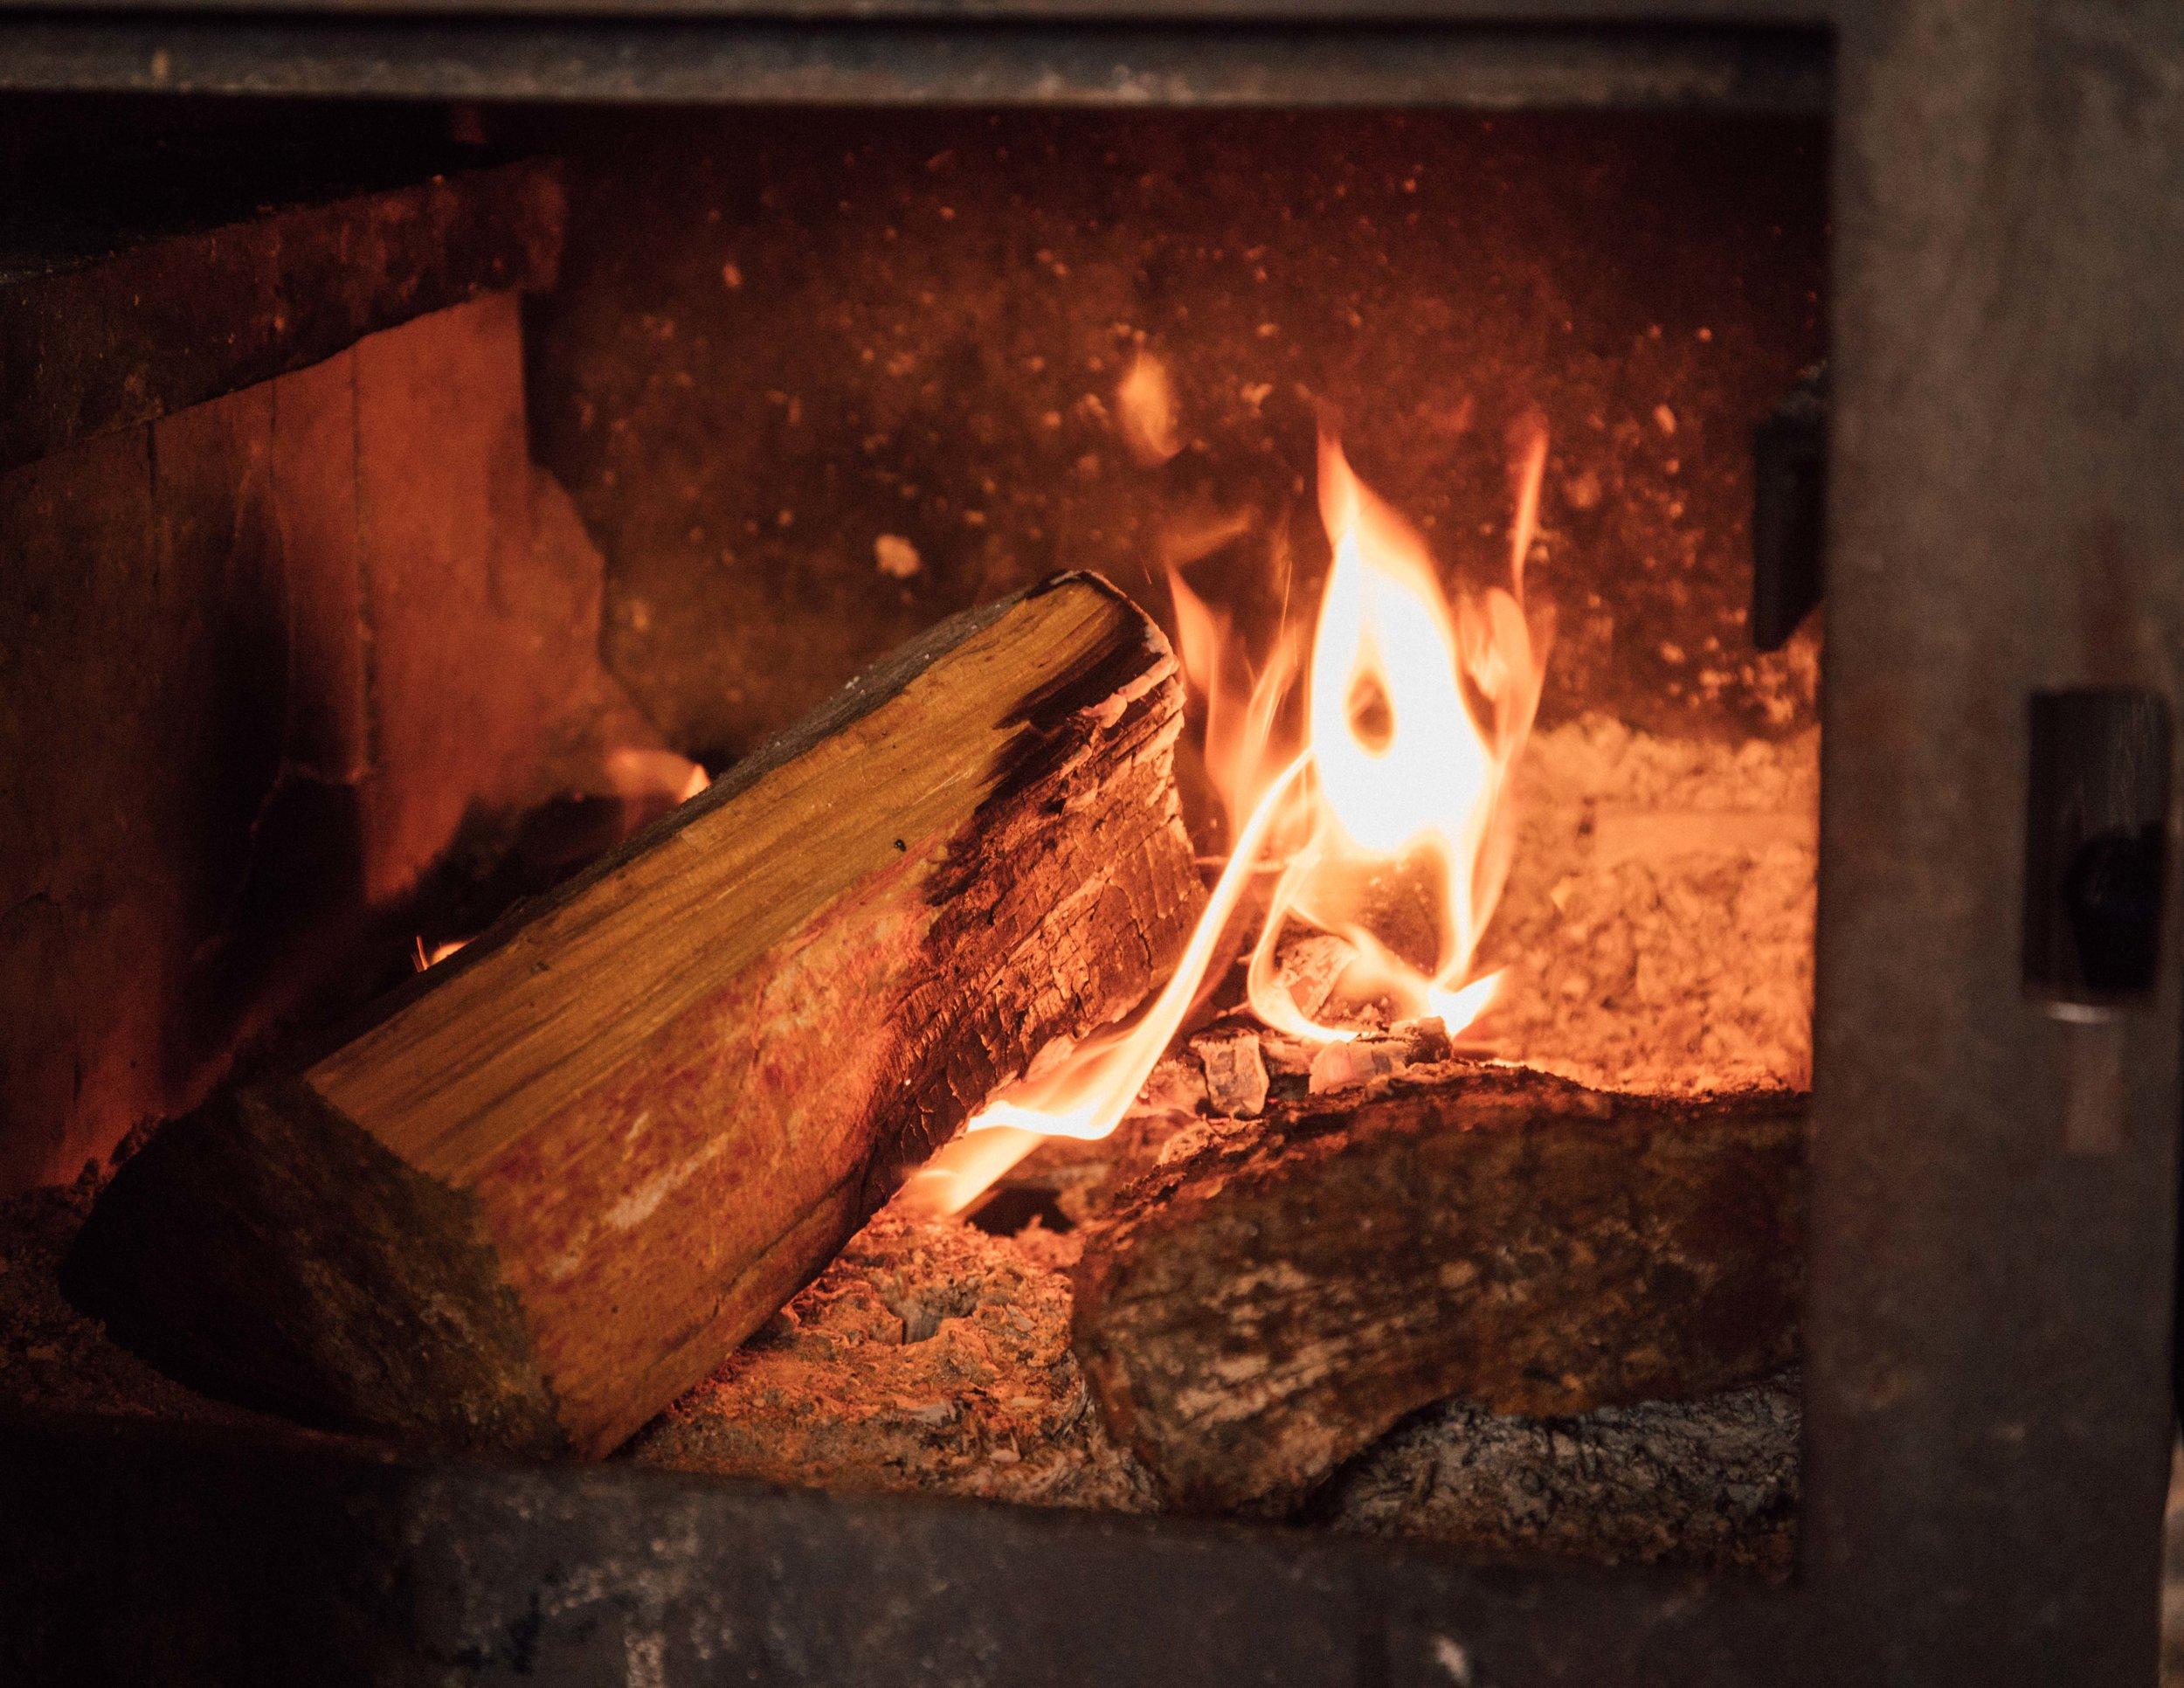 Wood fire at Waiopaoa Hut, Lake Waikaremoana